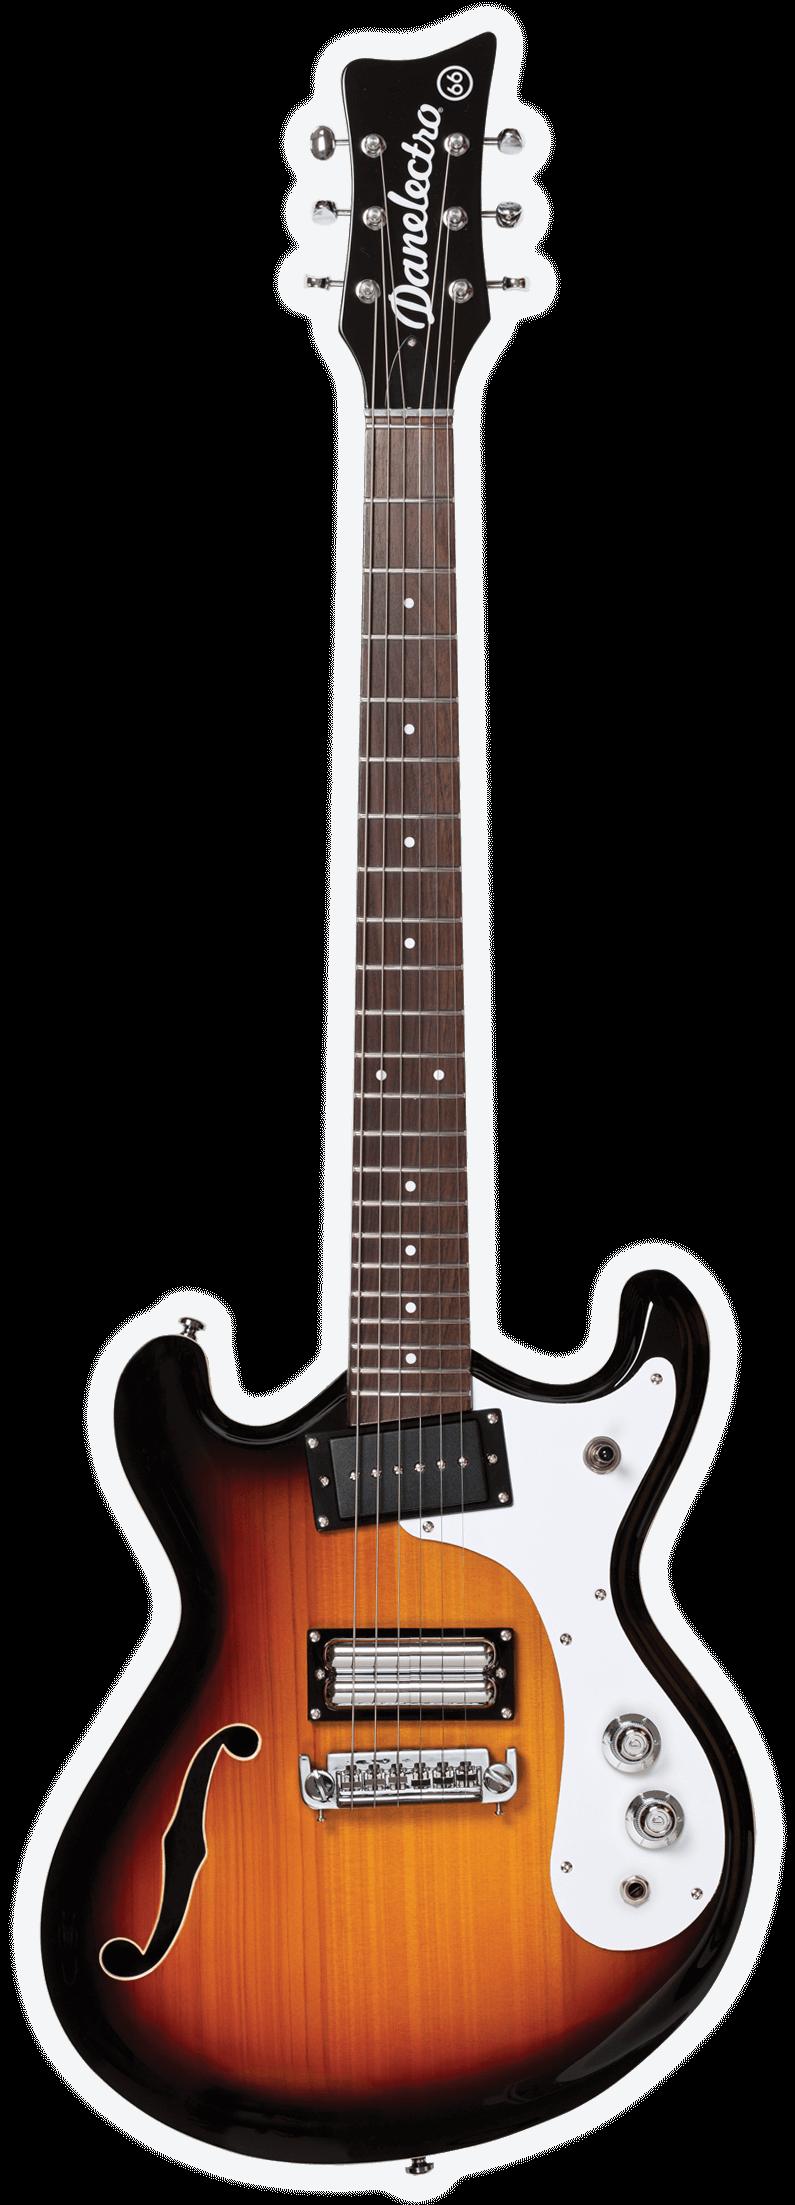 New 66 Danelectro Guitars